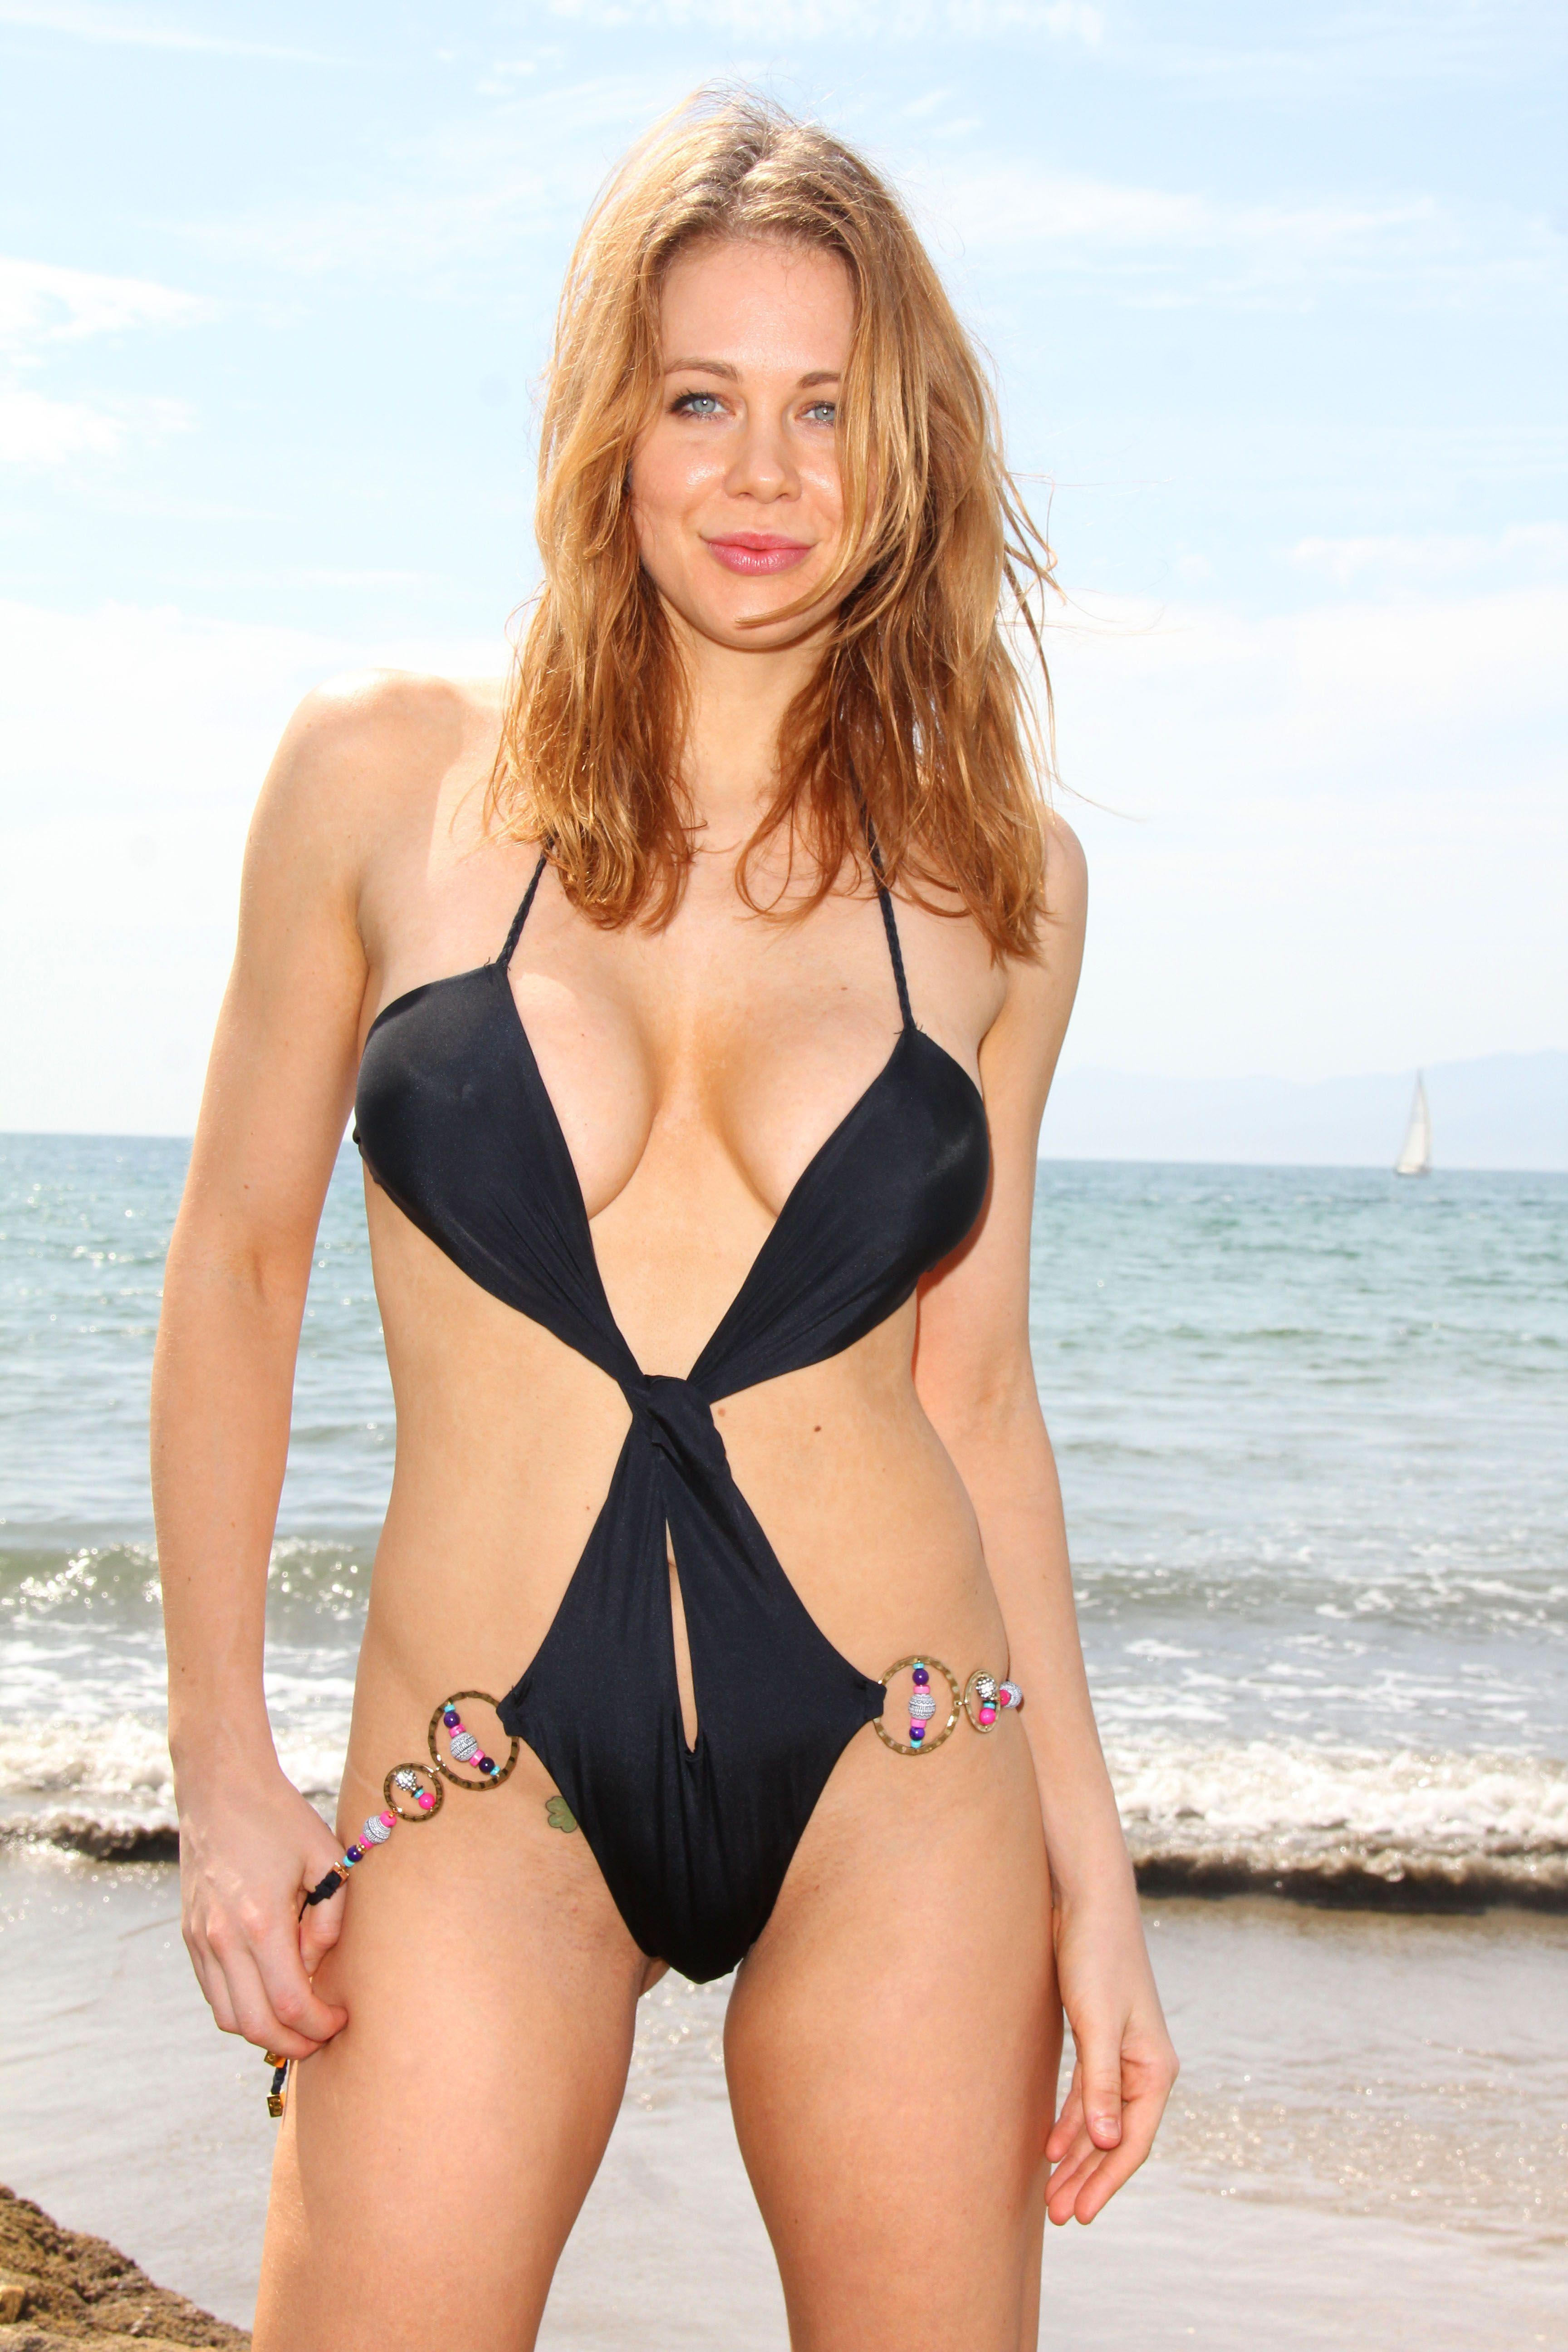 Pictures Michella McCollum naked (77 photo), Pussy, Bikini, Boobs, butt 2020